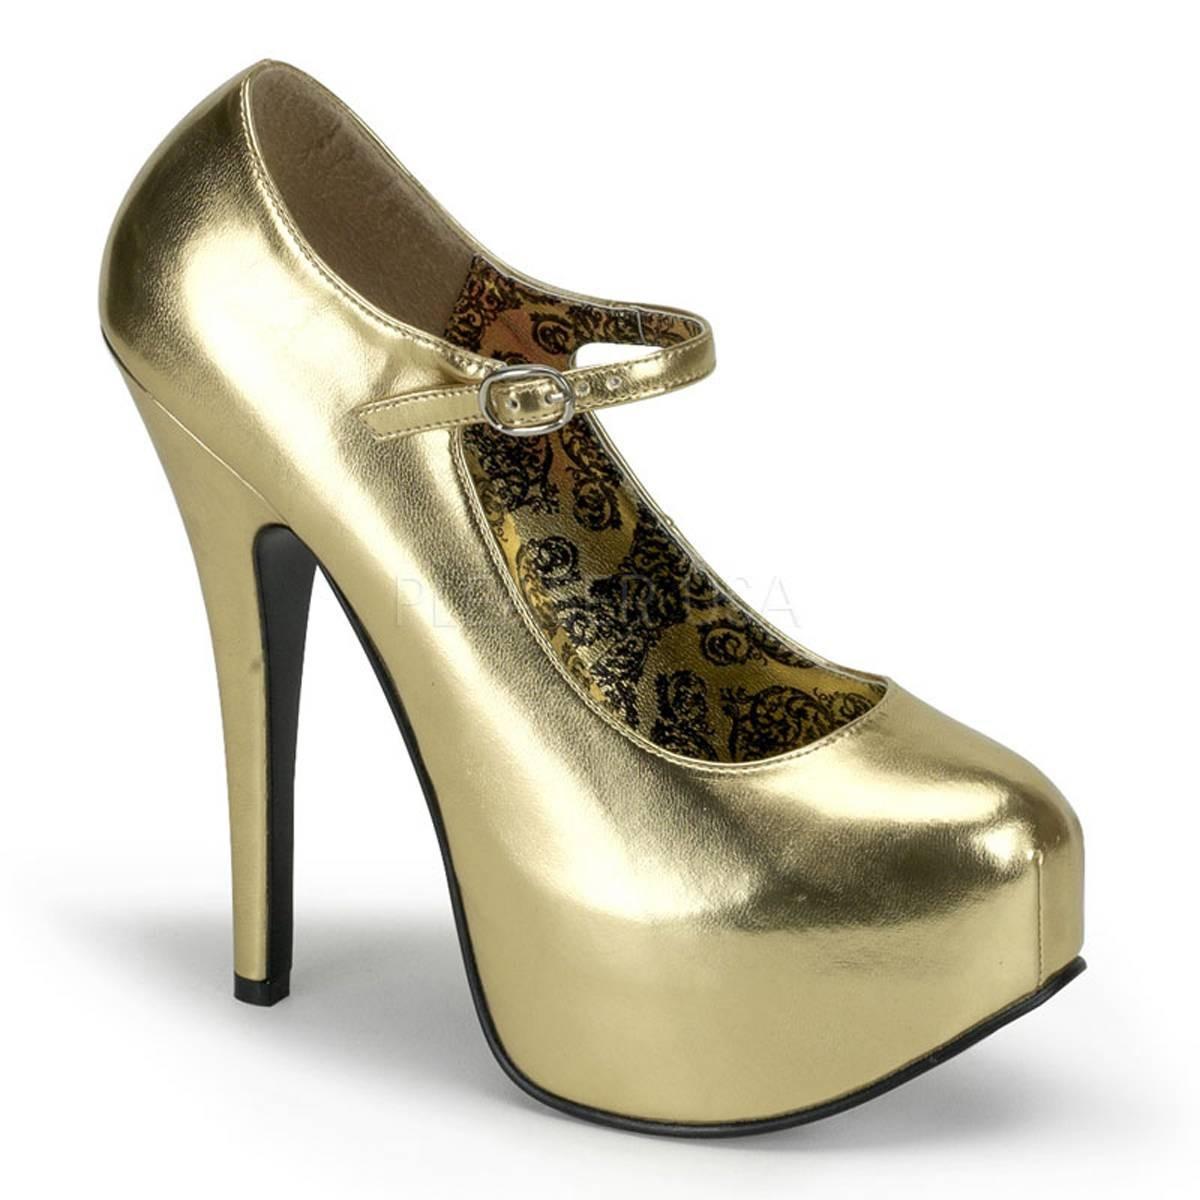 Highheels - TEEZE 07 ° Damen Pumps ° Gold Matt ° Bordello  - Onlineshop RedSixty